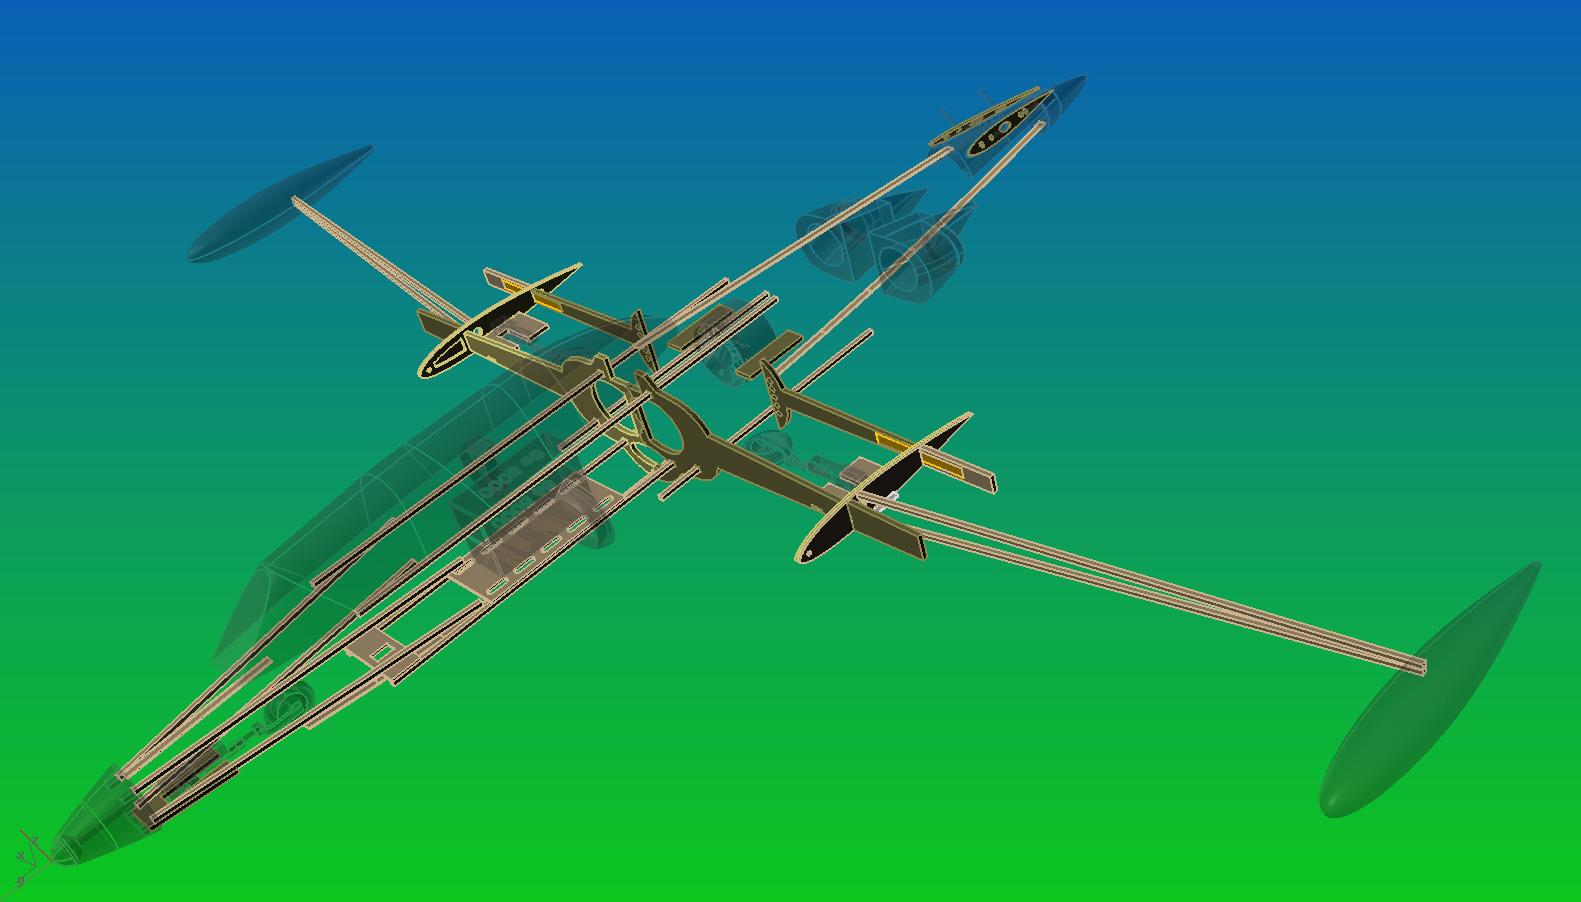 X-59 12.jpg